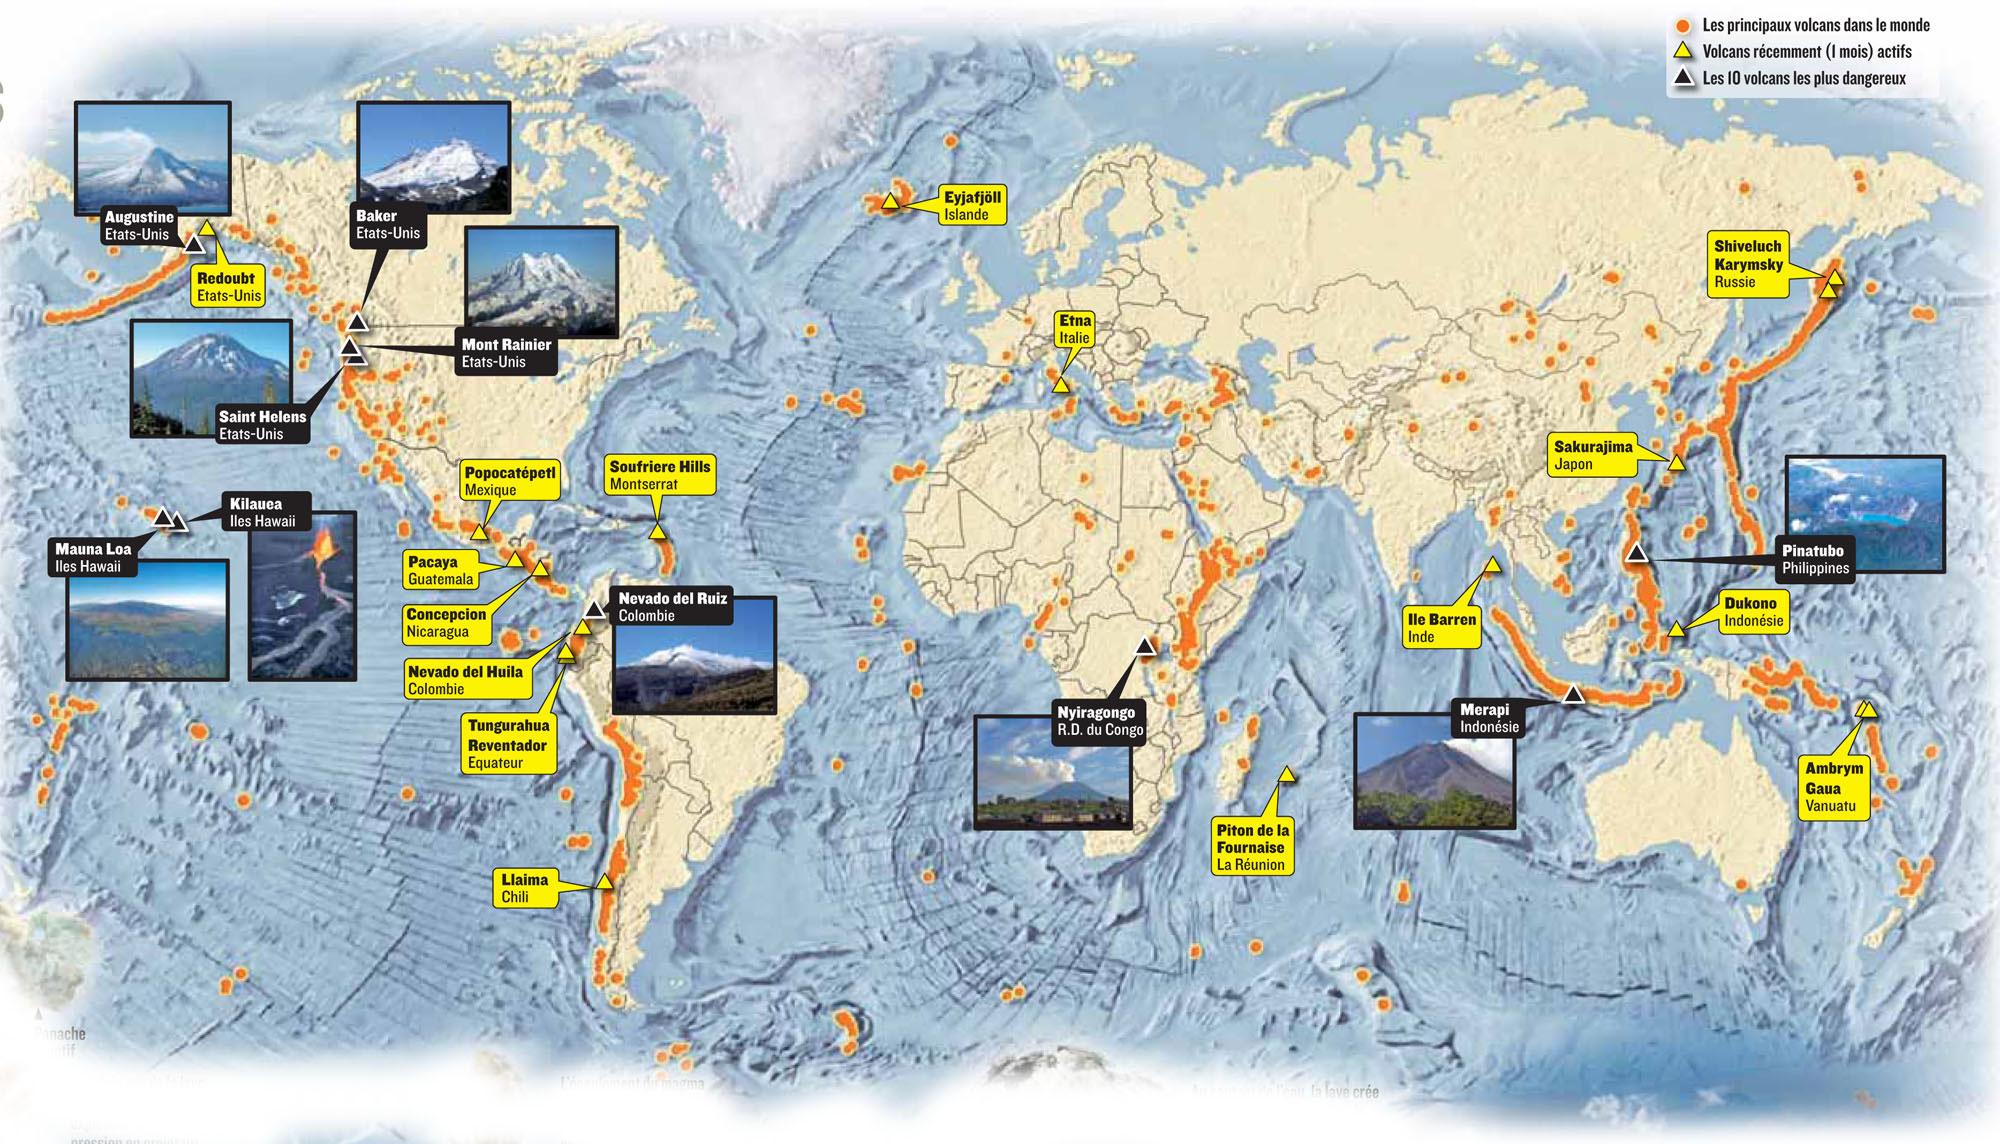 carte-du-monde-volcans